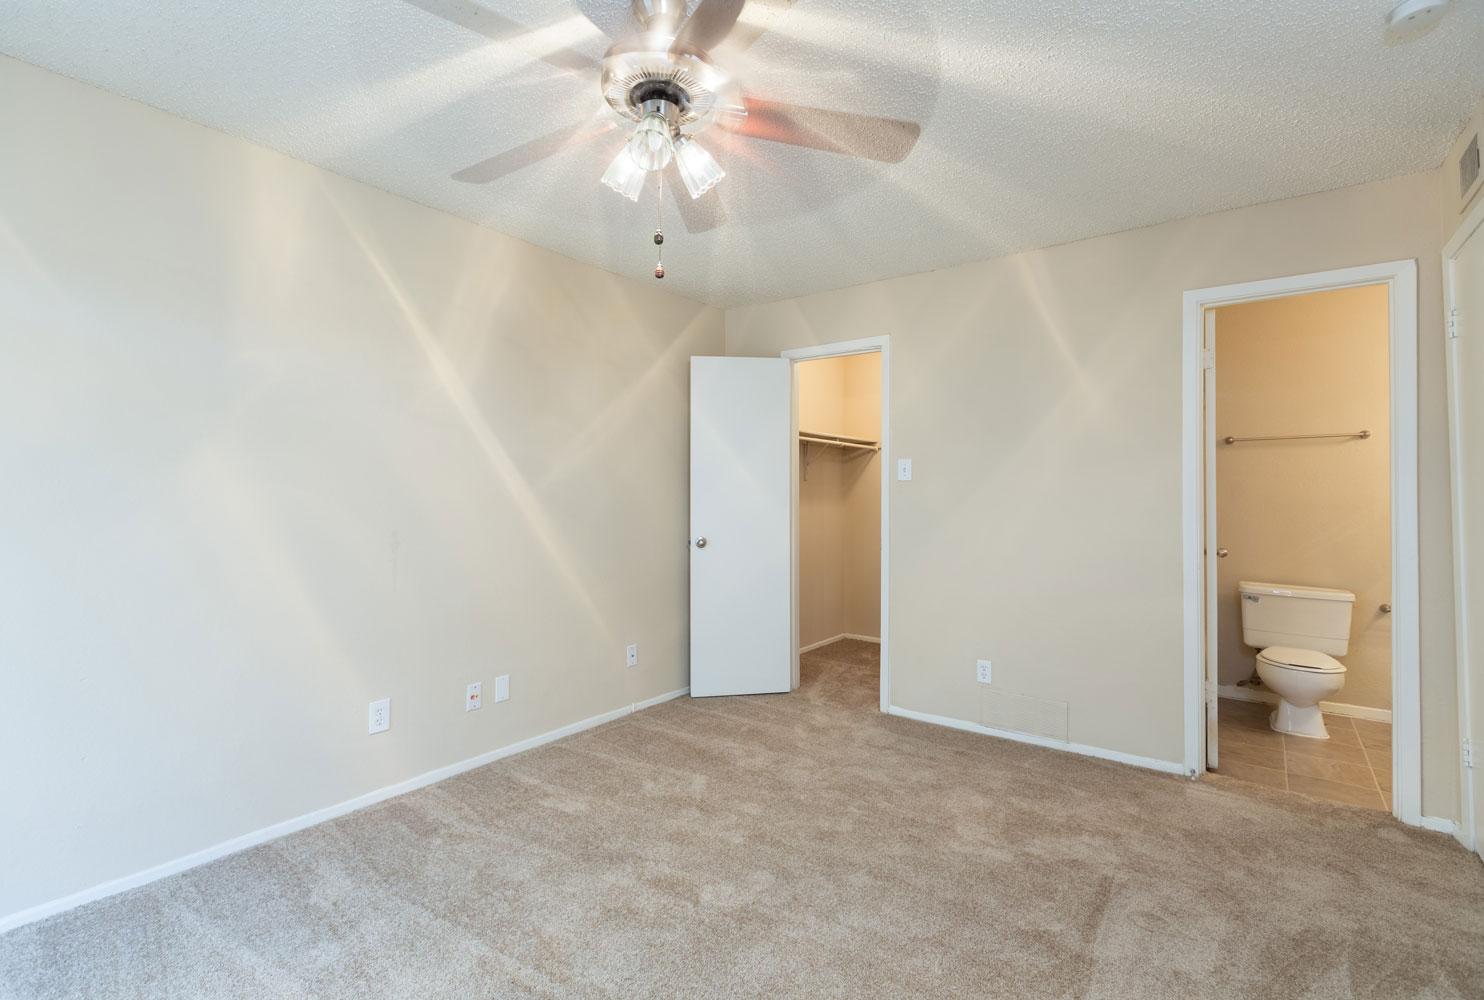 Multi-Speed Ceiling Fans at Sapphire Apartments in San Antonio, Texas